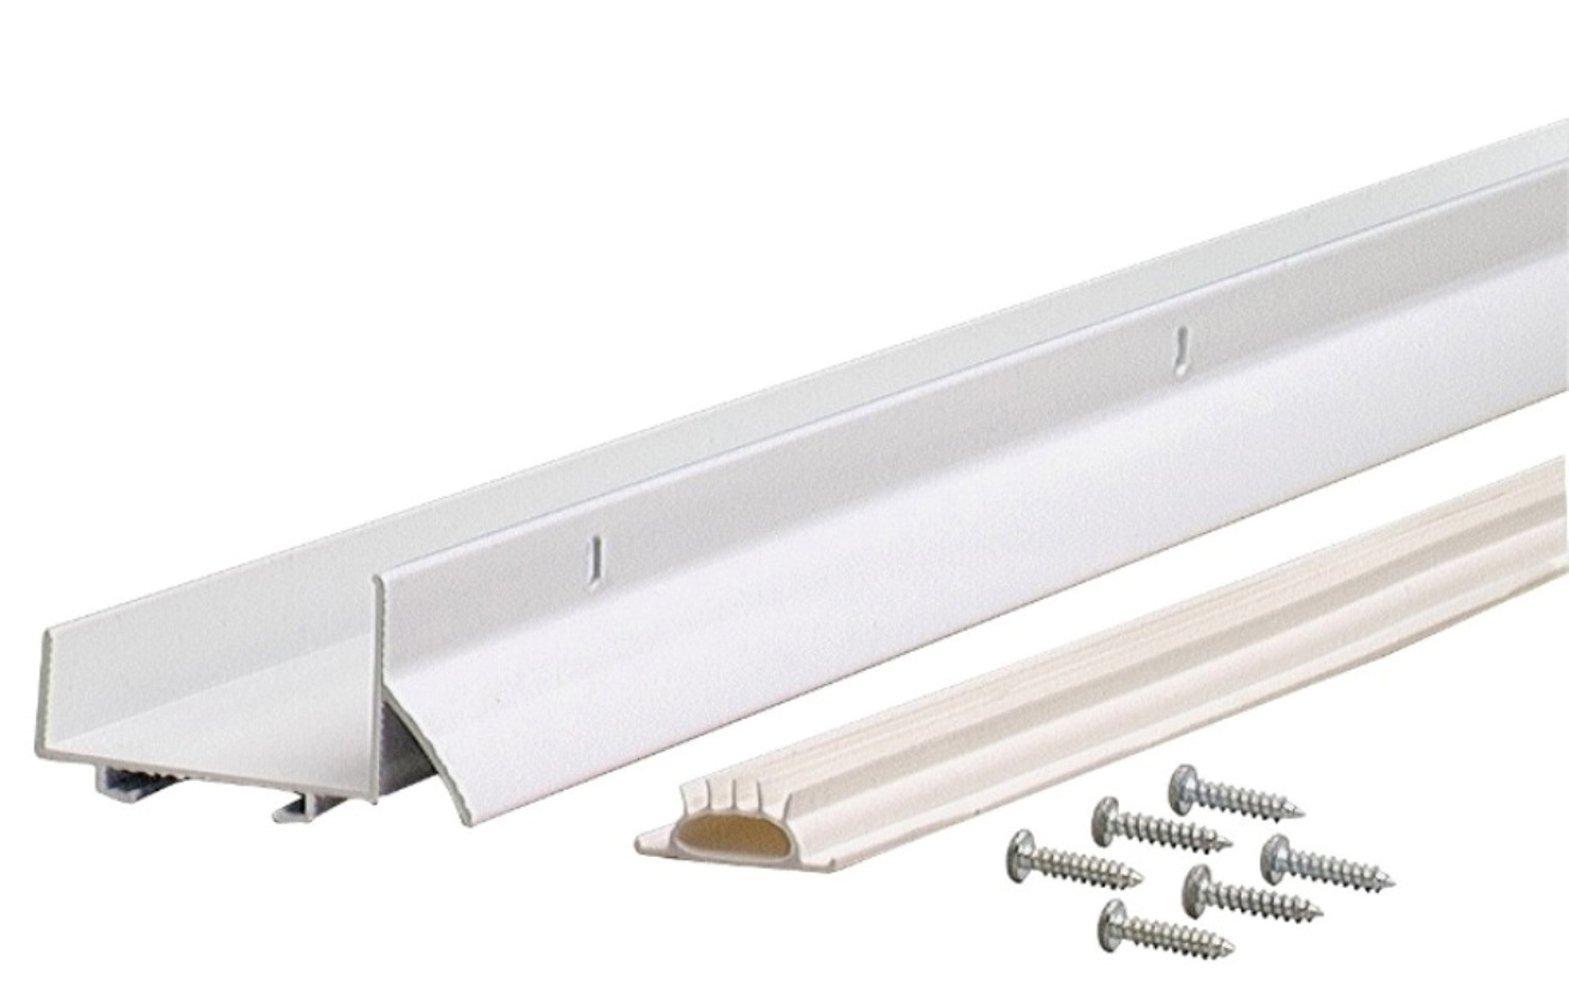 M-D Building Products 6403 36-Inch Fits 1-3/4-Inch Doors U-Shaped Door Bottom with Drip Cap